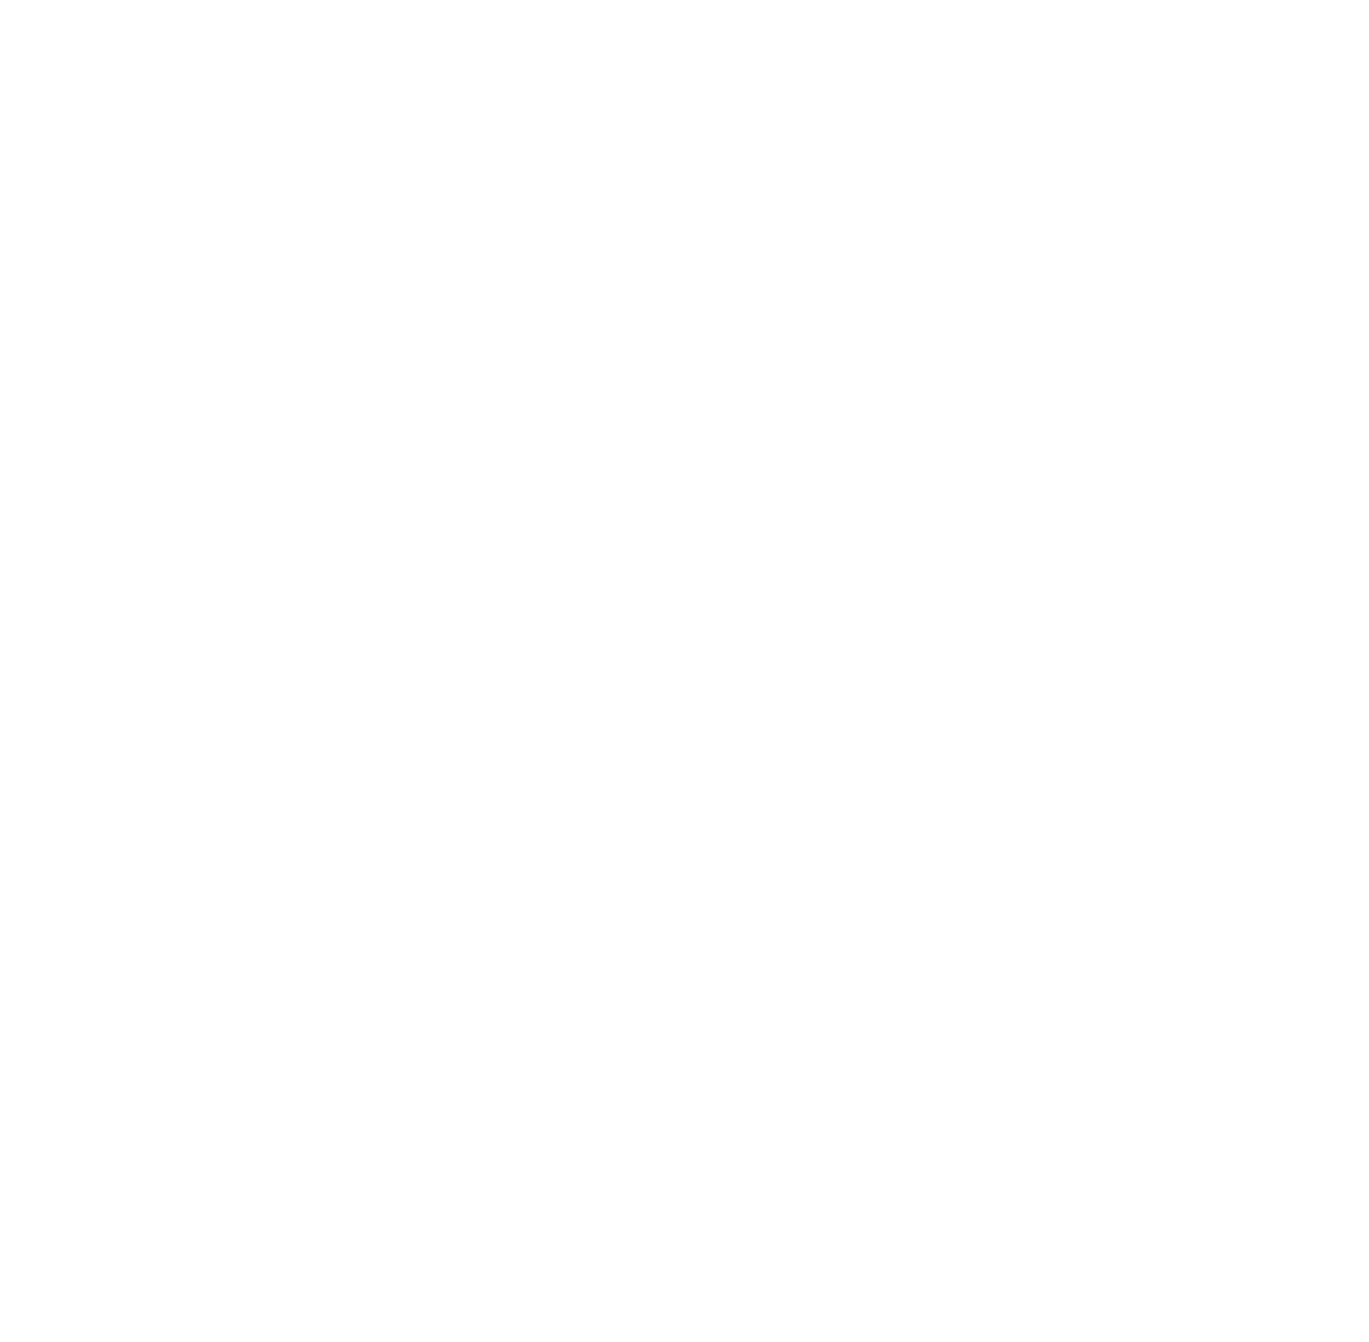 Logo, Font